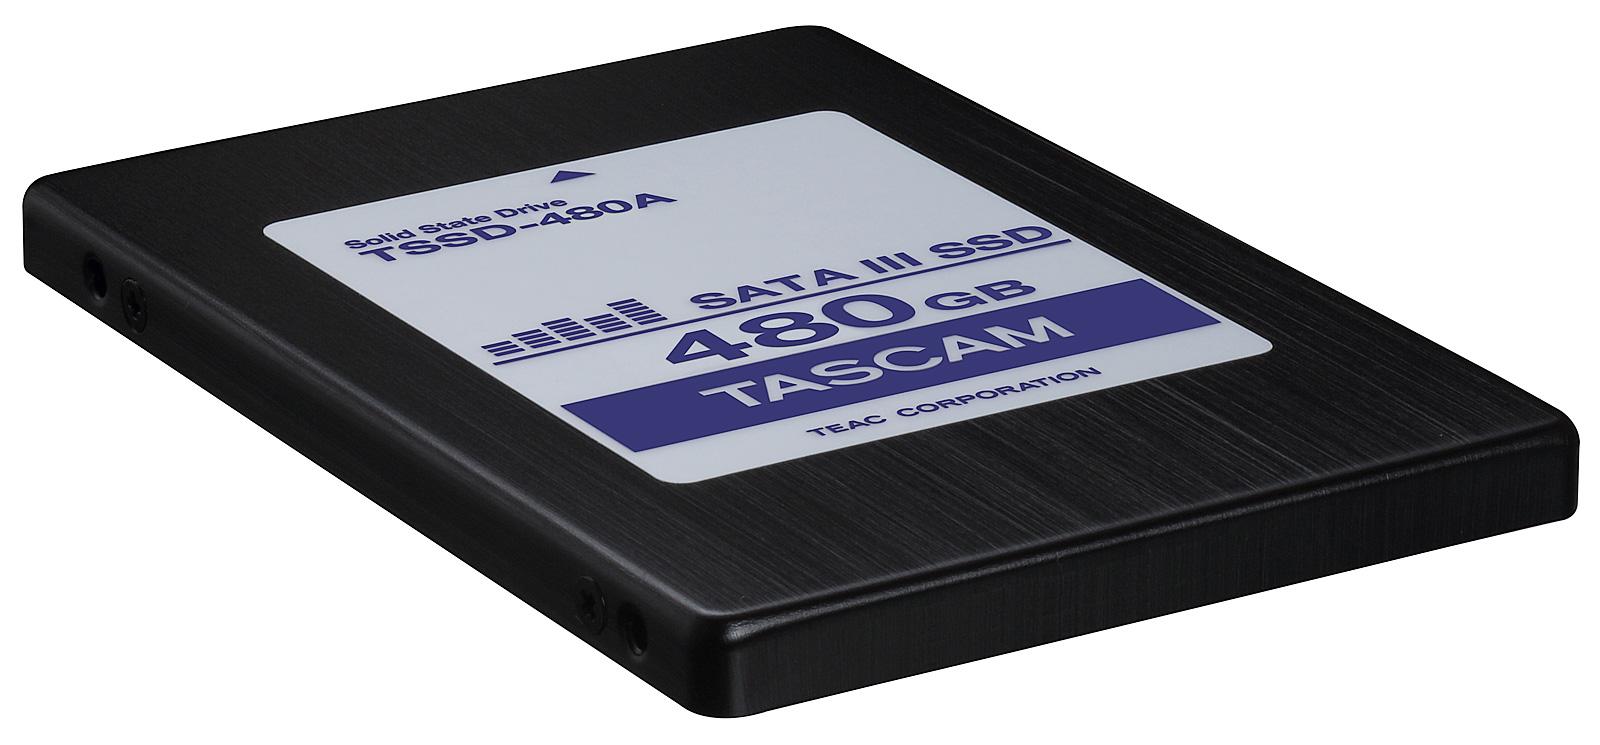 Tascam TSSD-480A SSD harddisk 480GB til DA-6400